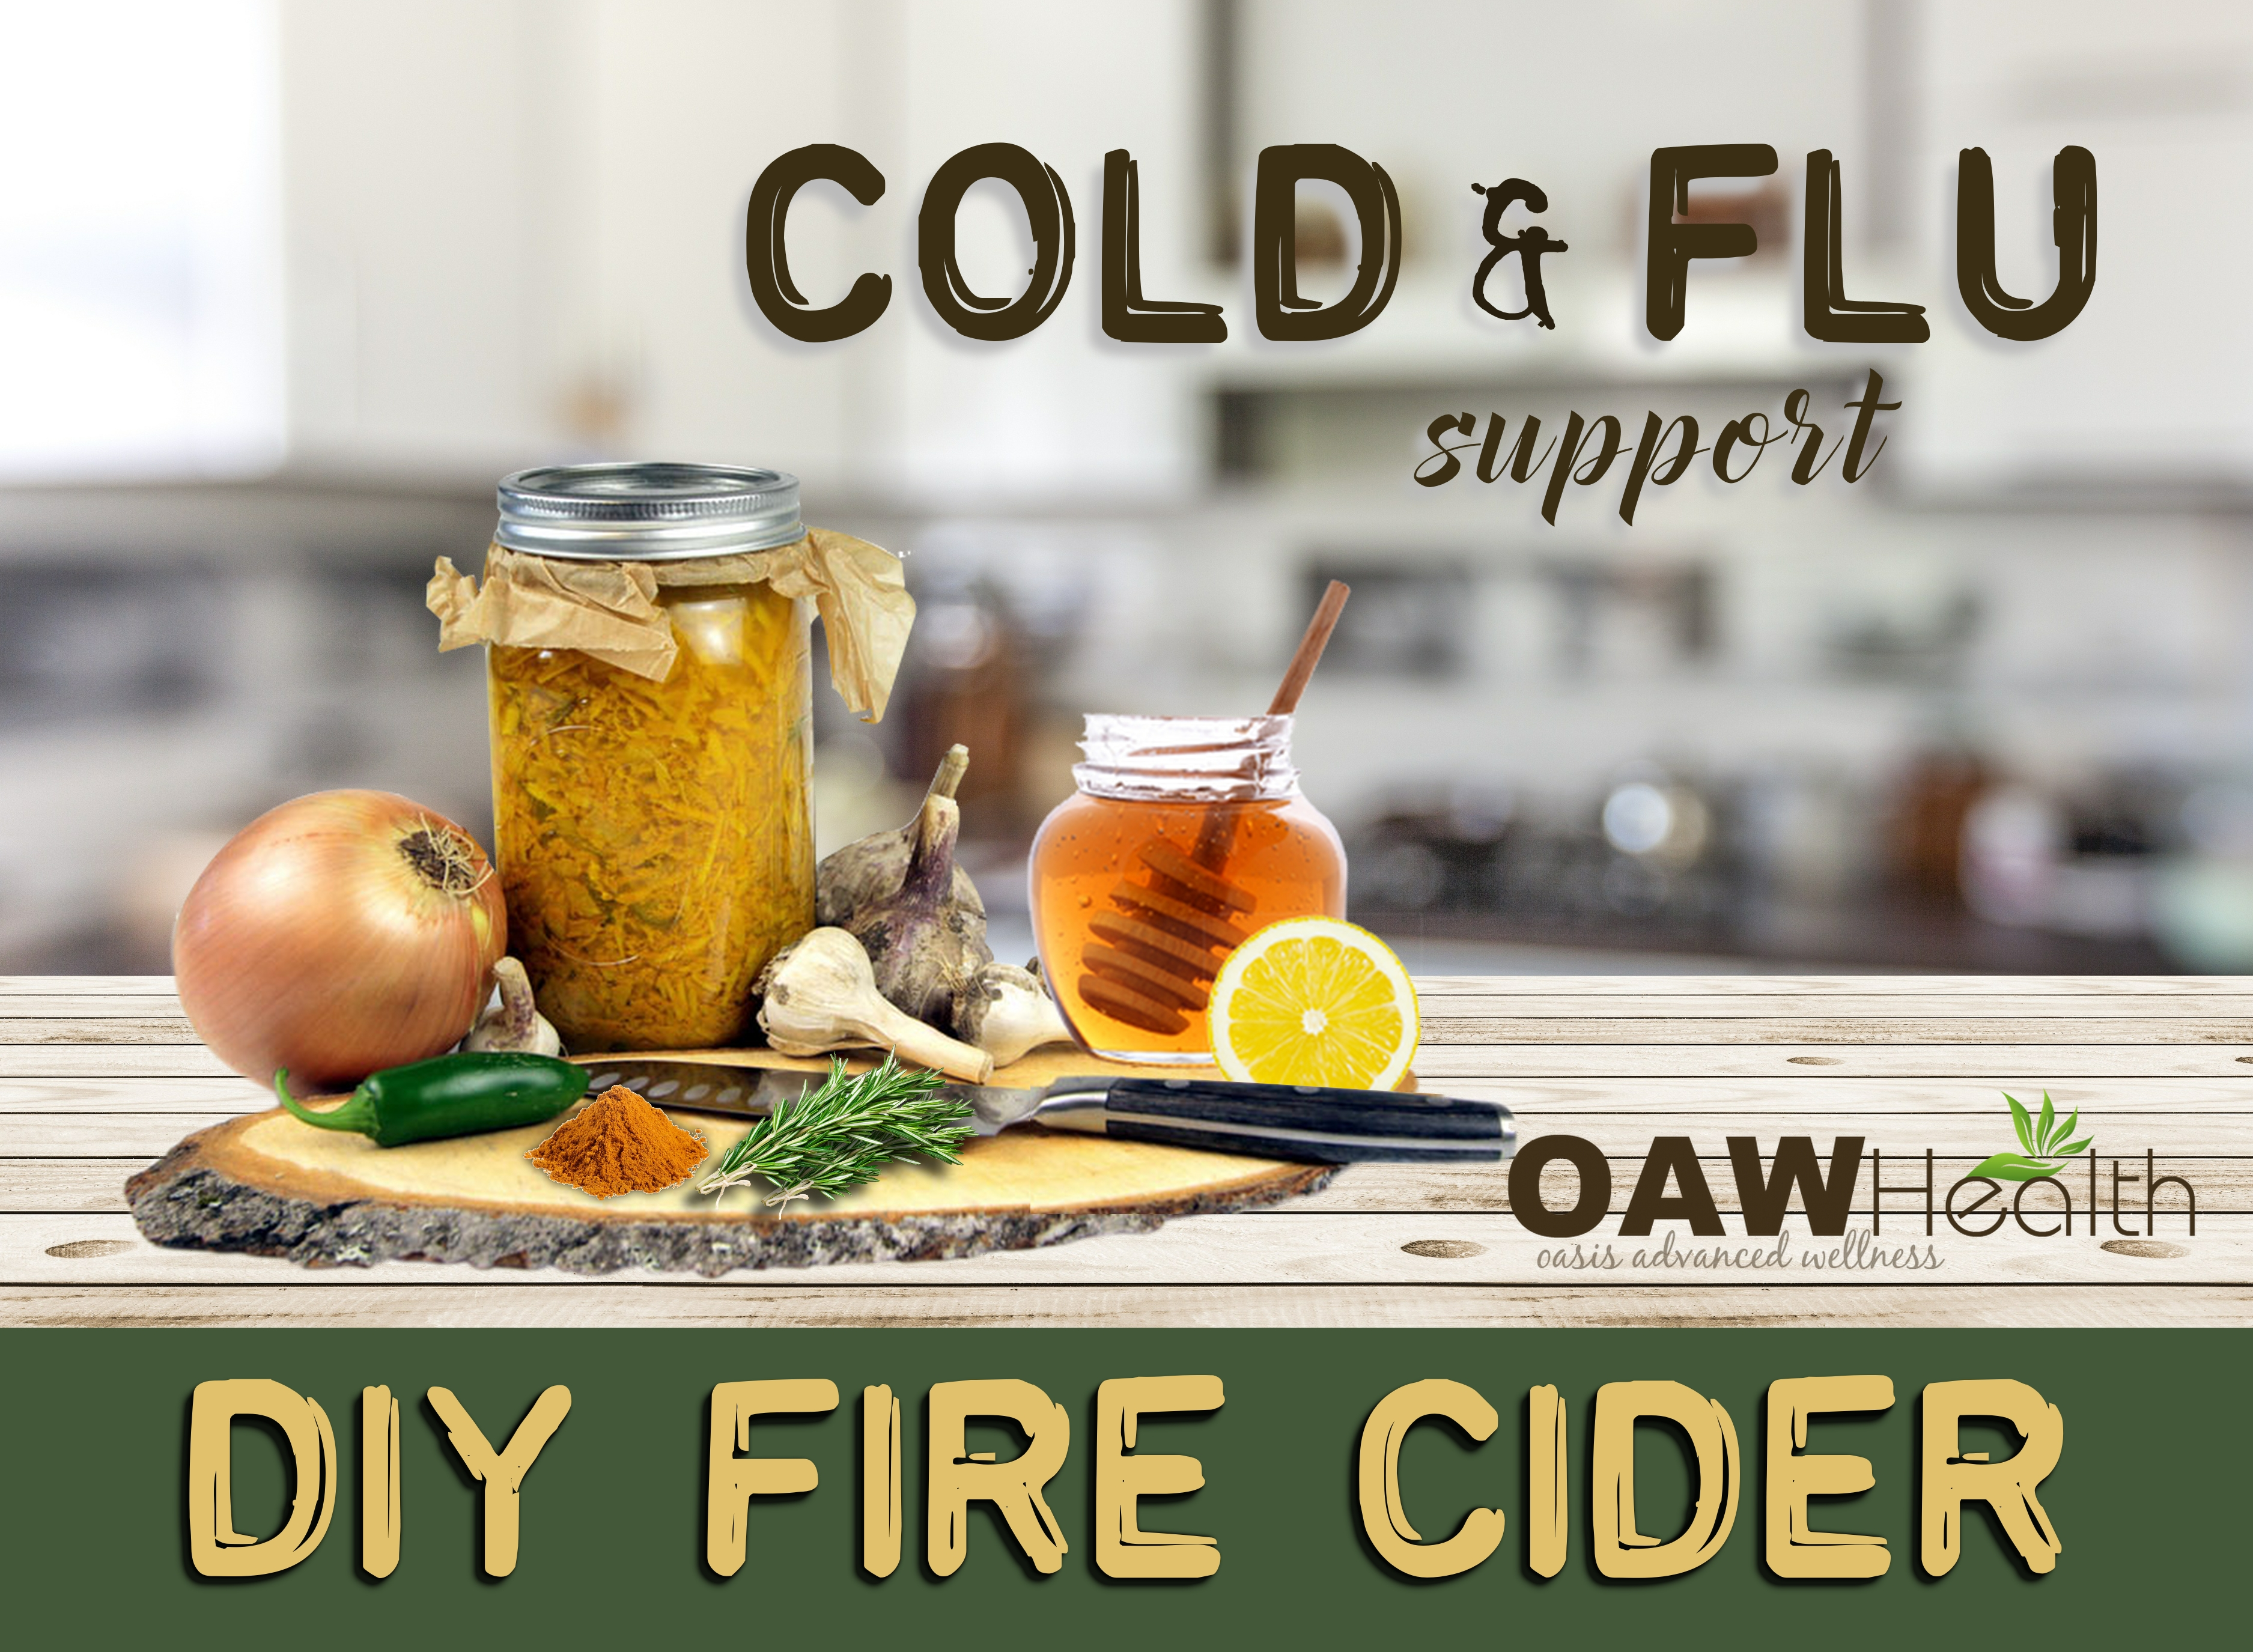 Fire Cider Recipe – Cold & Flu Folk Remedy